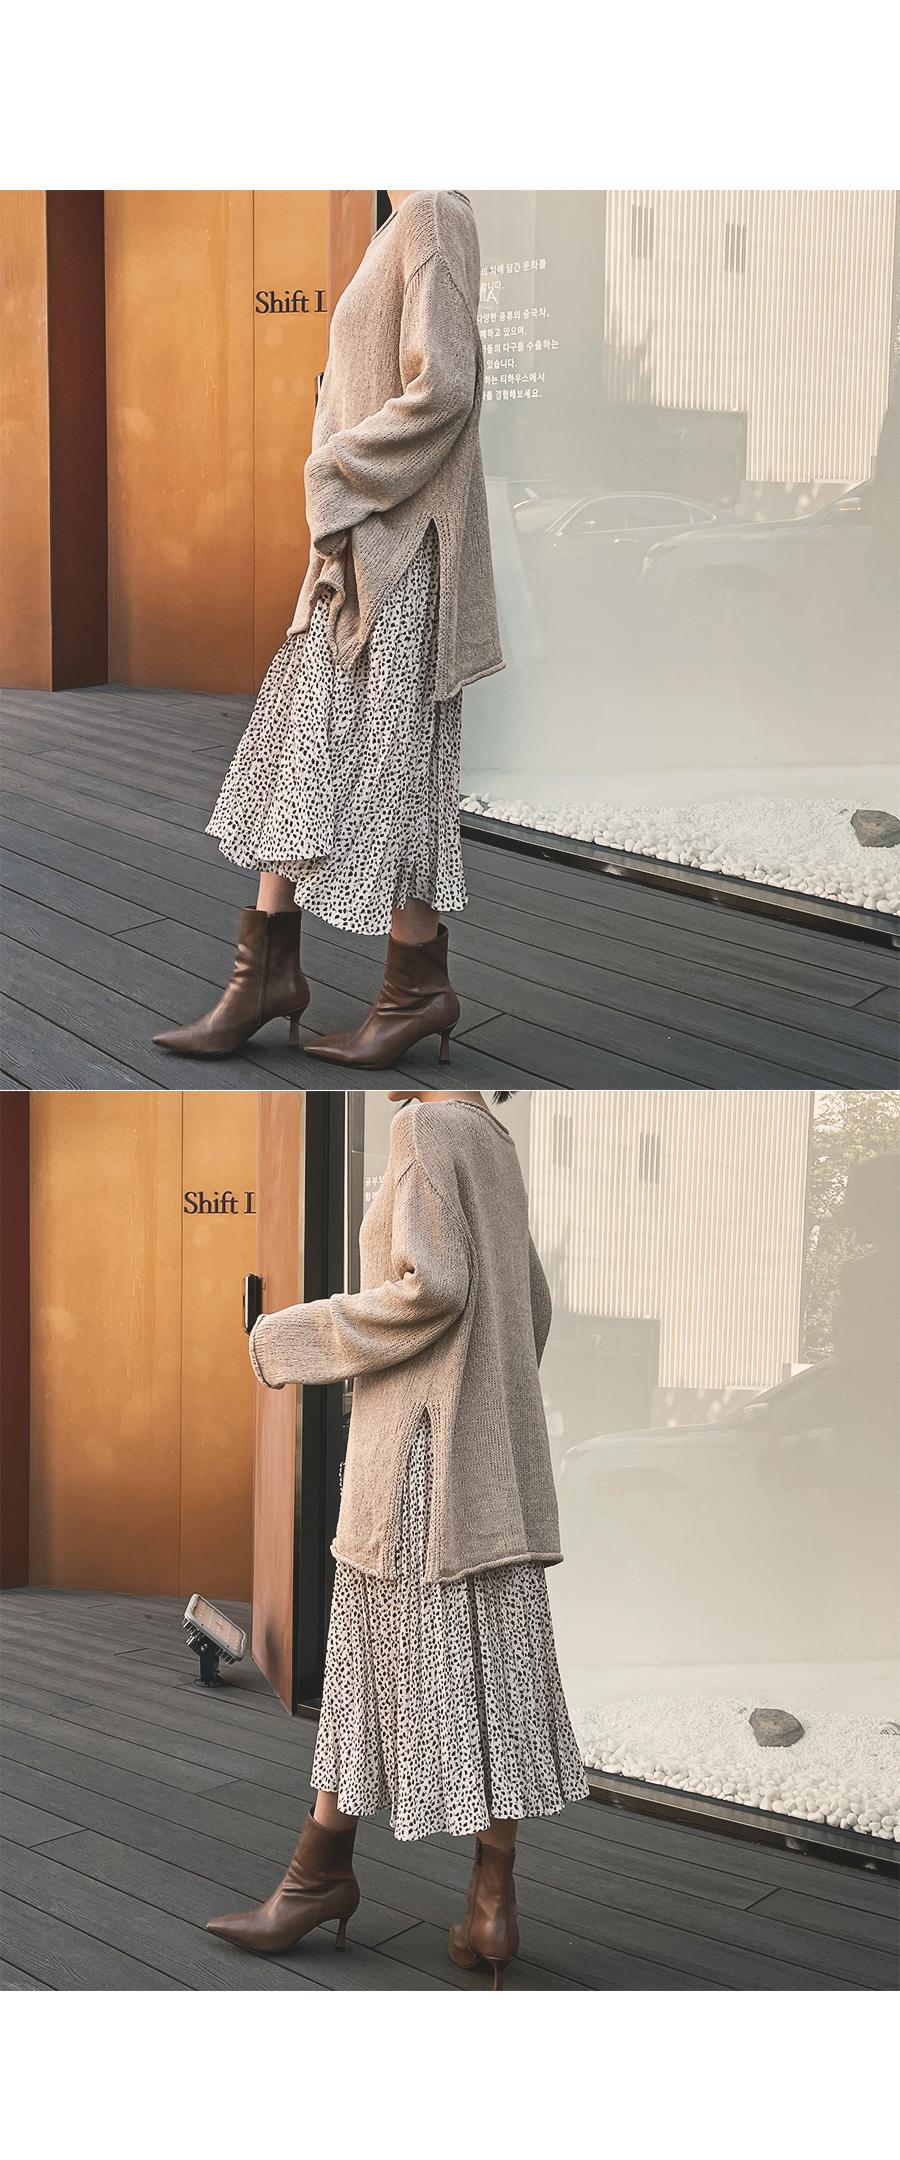 dress model image-S7L12